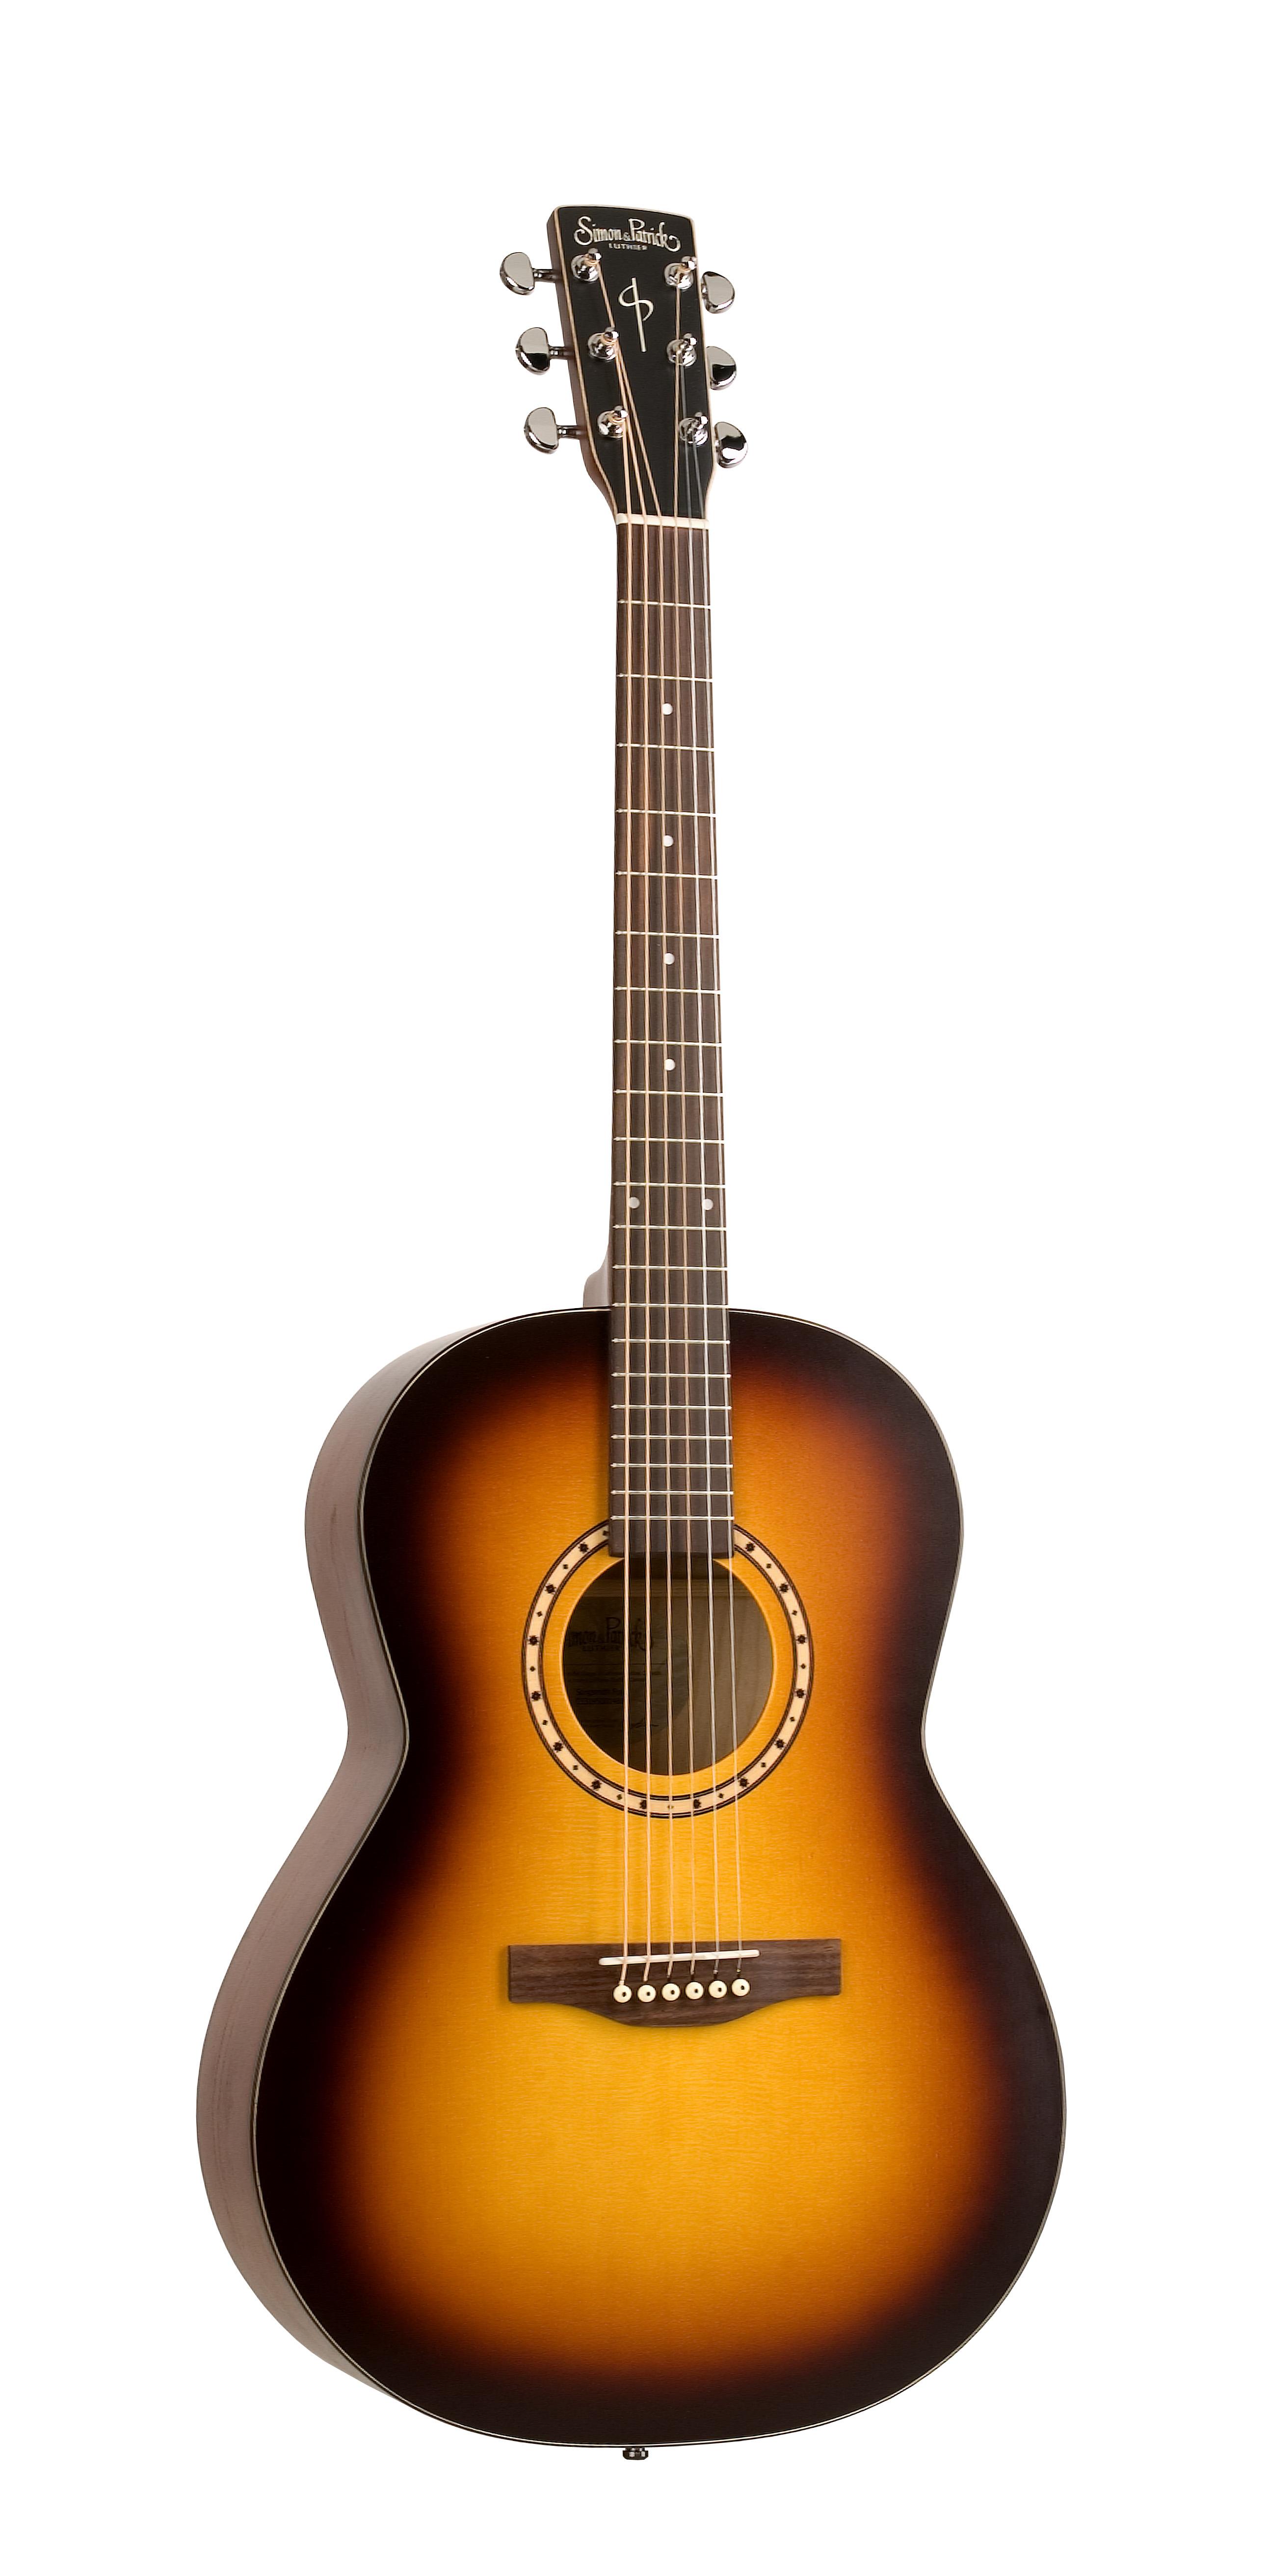 Simon & Patrick 33195 Songsmith Varnish Burst Folk Acoustic Guitar